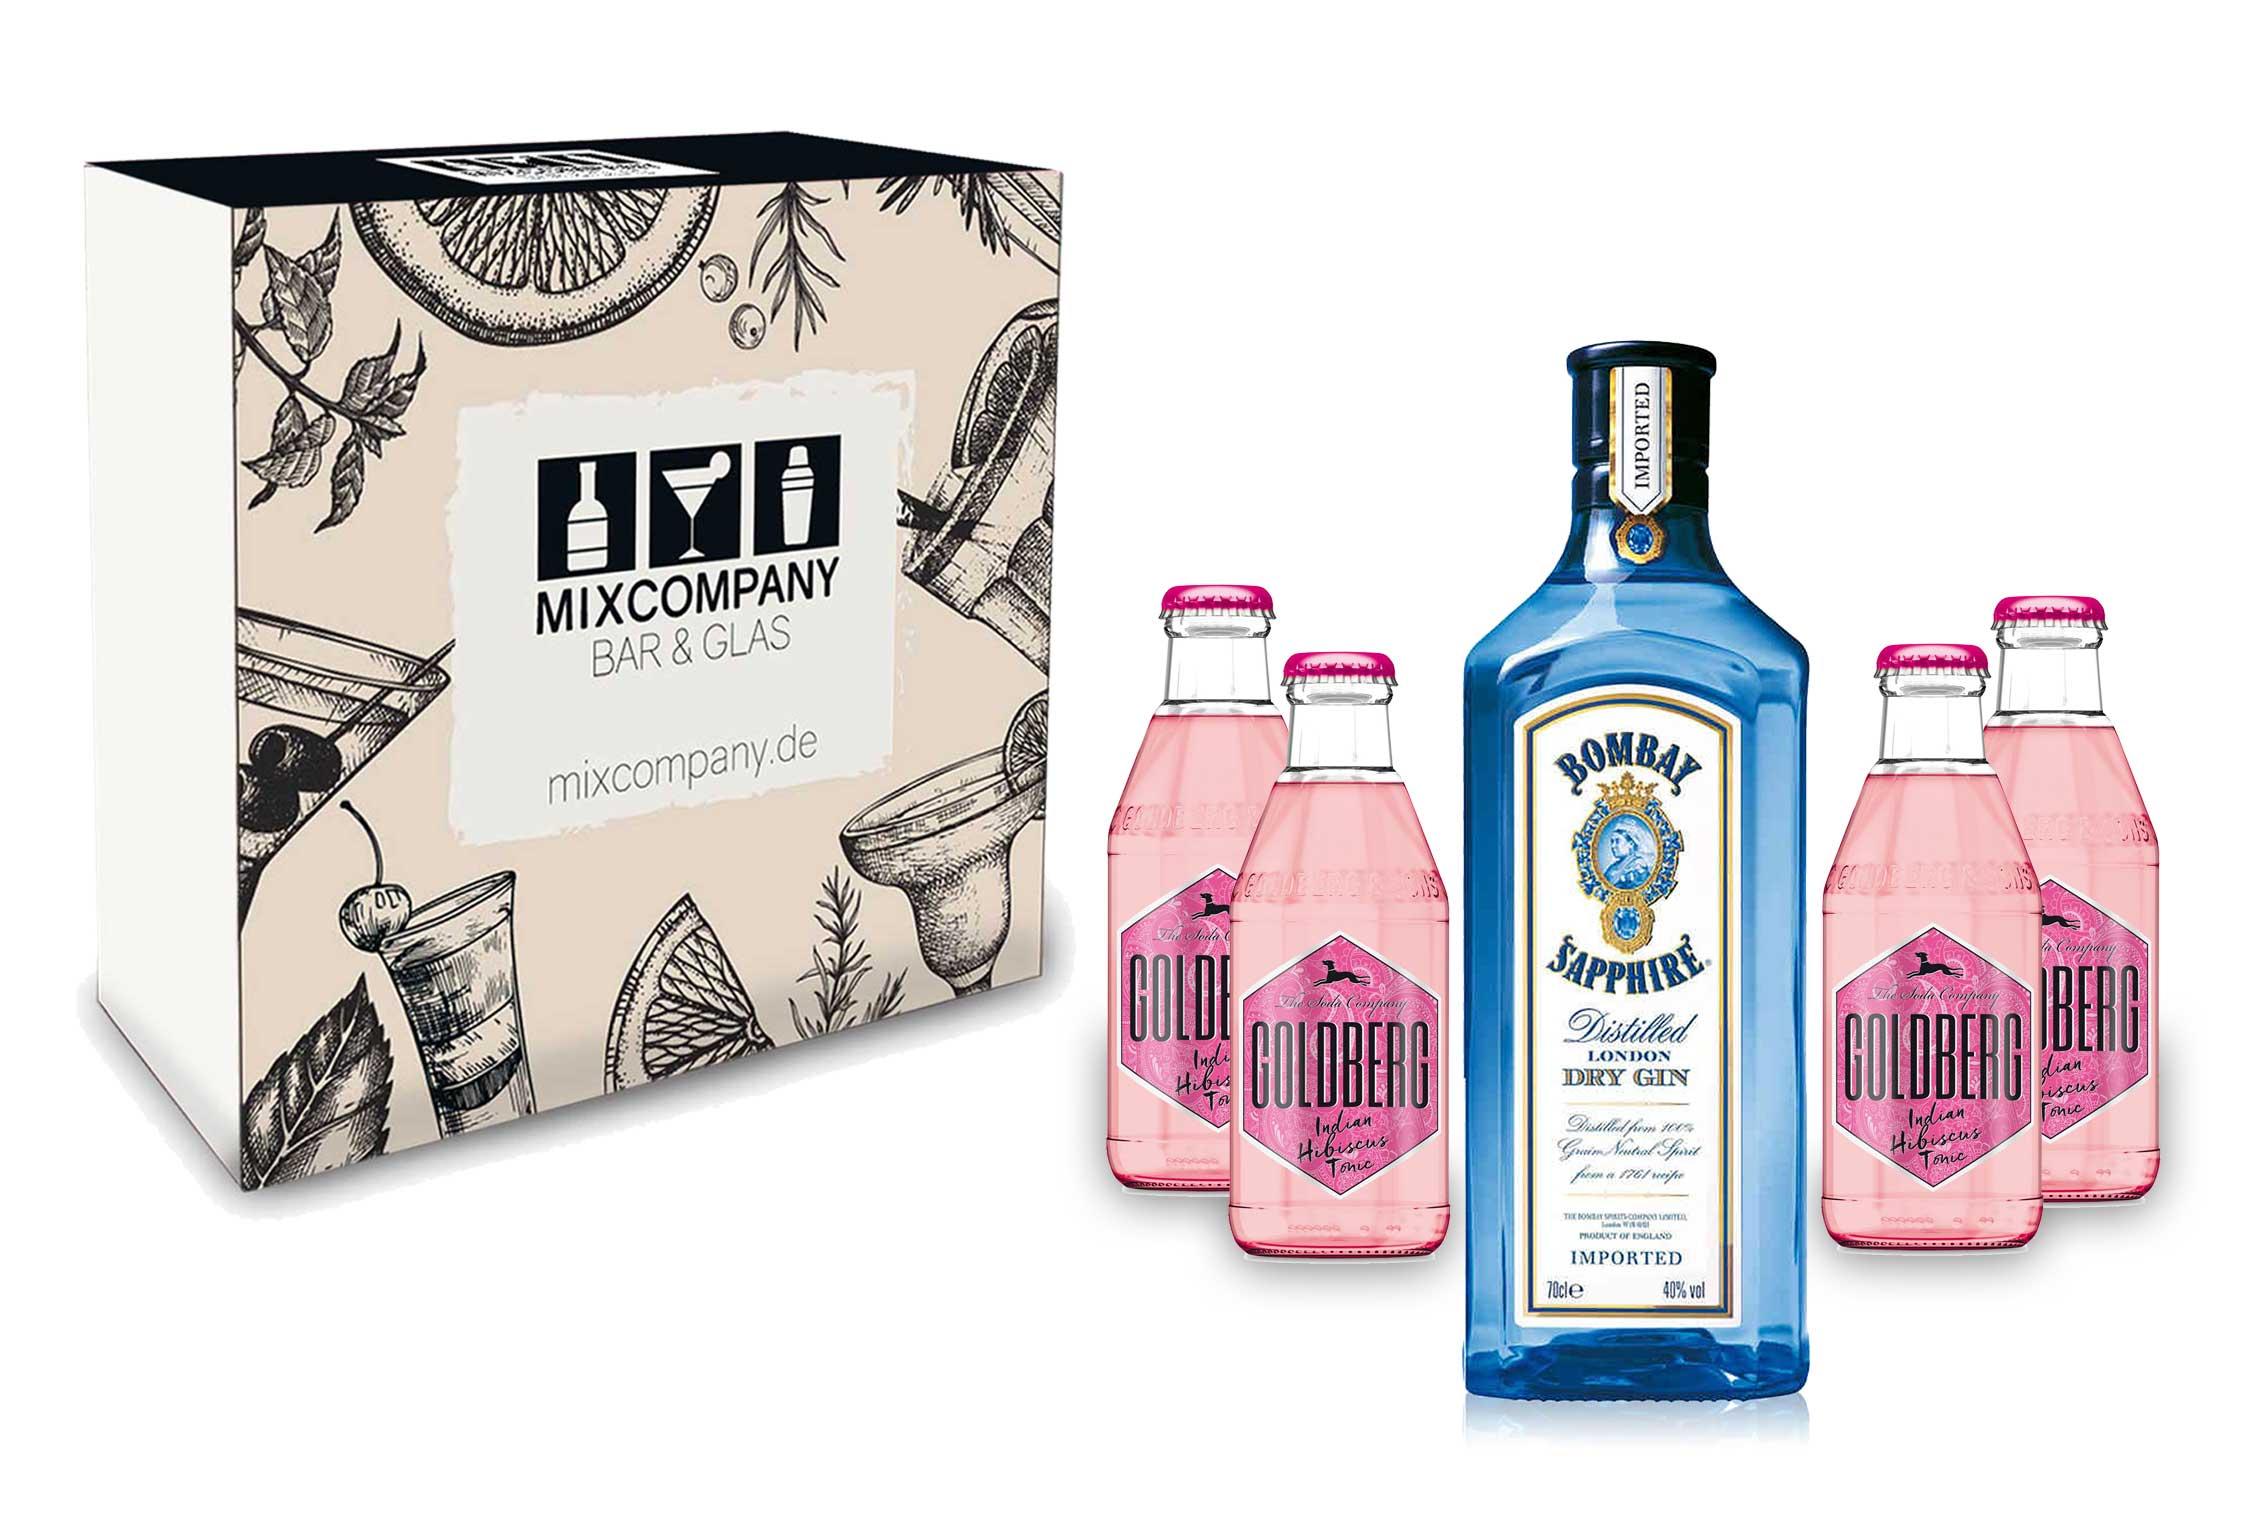 Gin Tonic Set Giftbox Geschenkset - Bombay Sapphire London Dry Gin 0,7l 700ml (40% Vol) + 4x Goldberg Indian Hibiscus Tonic 200ml inkl. Pfand MEHRWEG -[Enthält Sulfite]